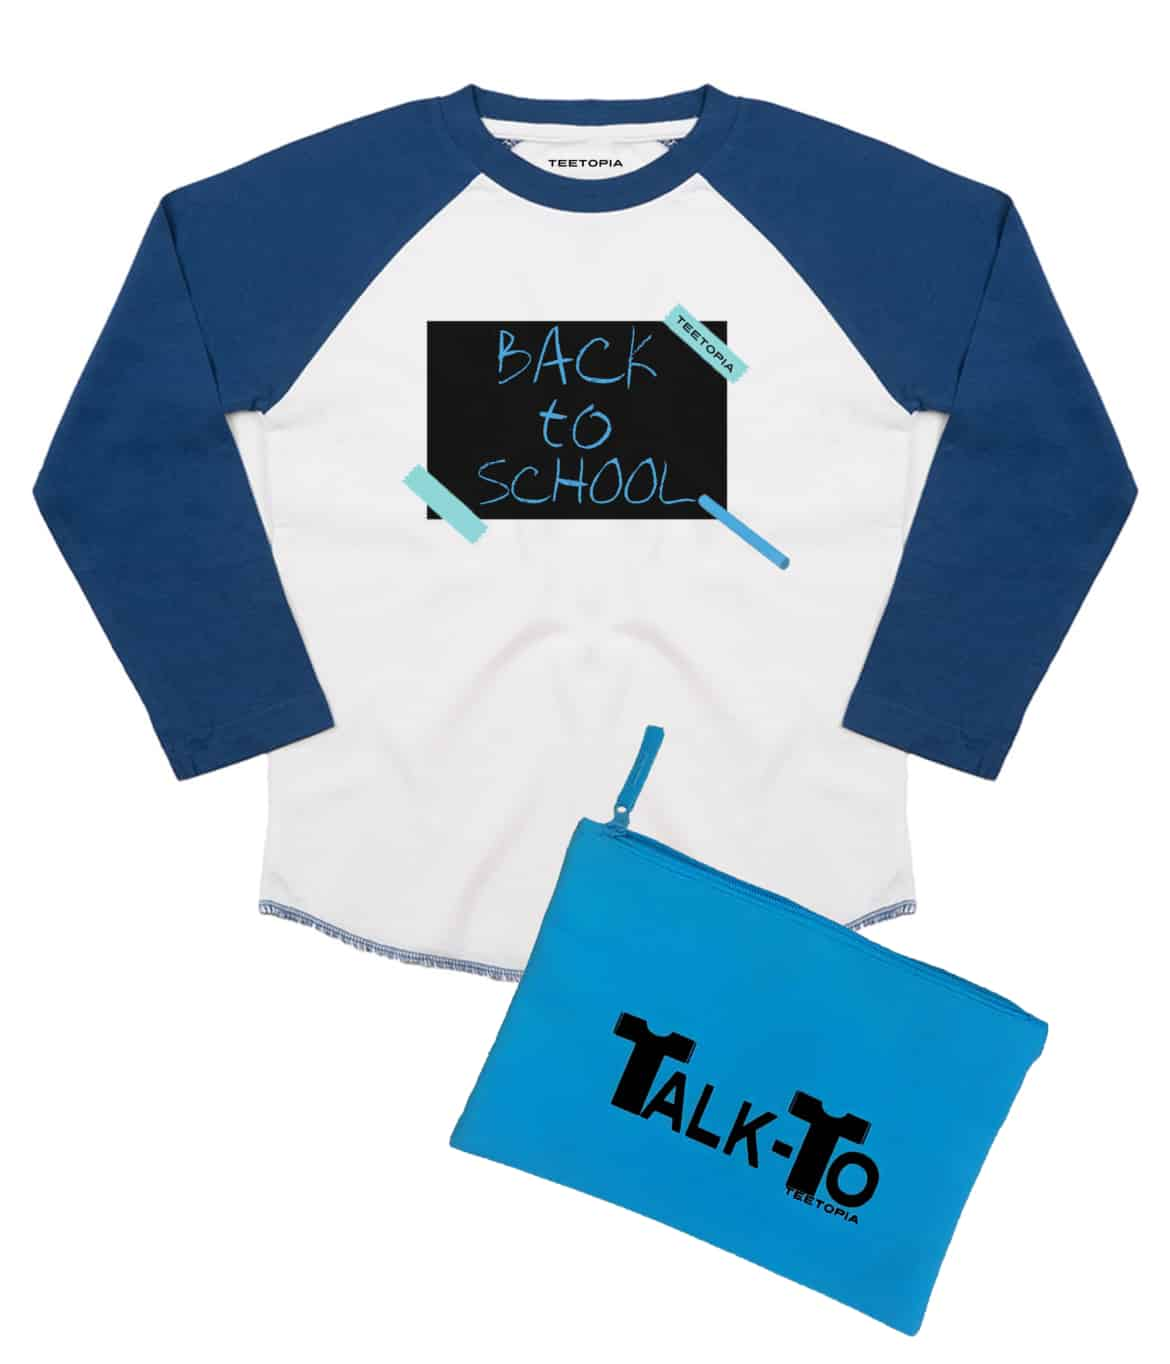 Teetopia lancia la caspule collection TALK TO…Kids